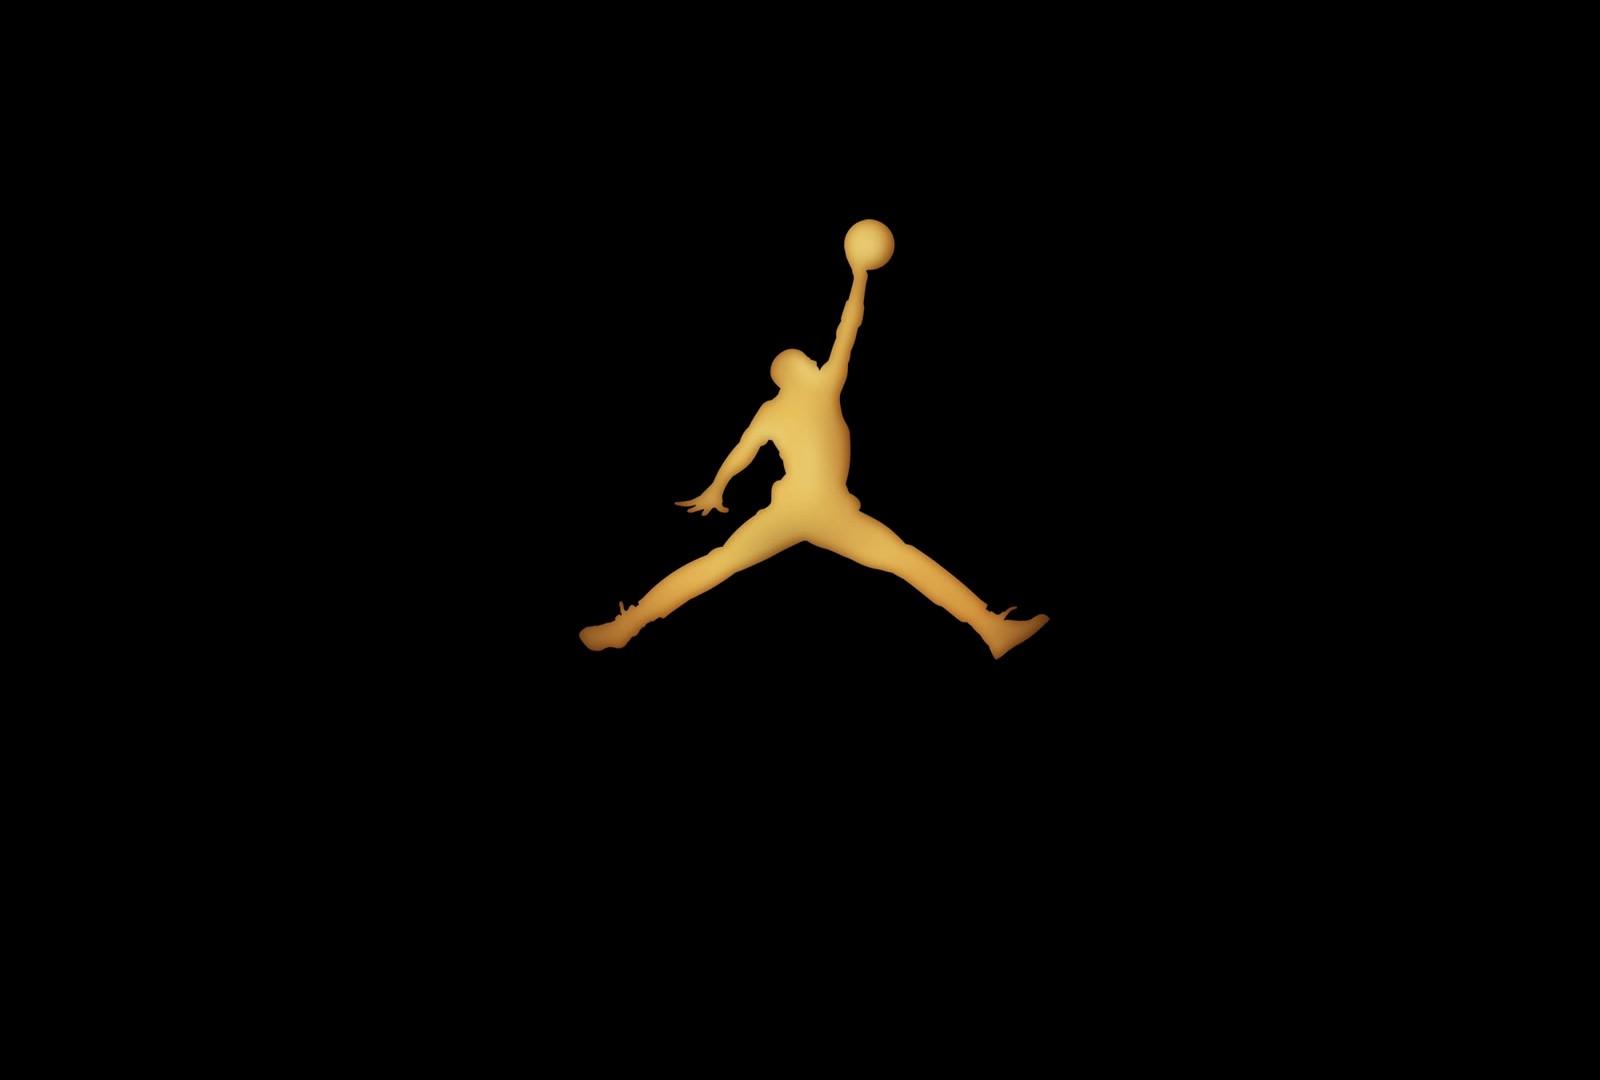 Jordans Wallpaper For Girls Basketball Wallpapers Hd Desktop And Mobile Backgrounds